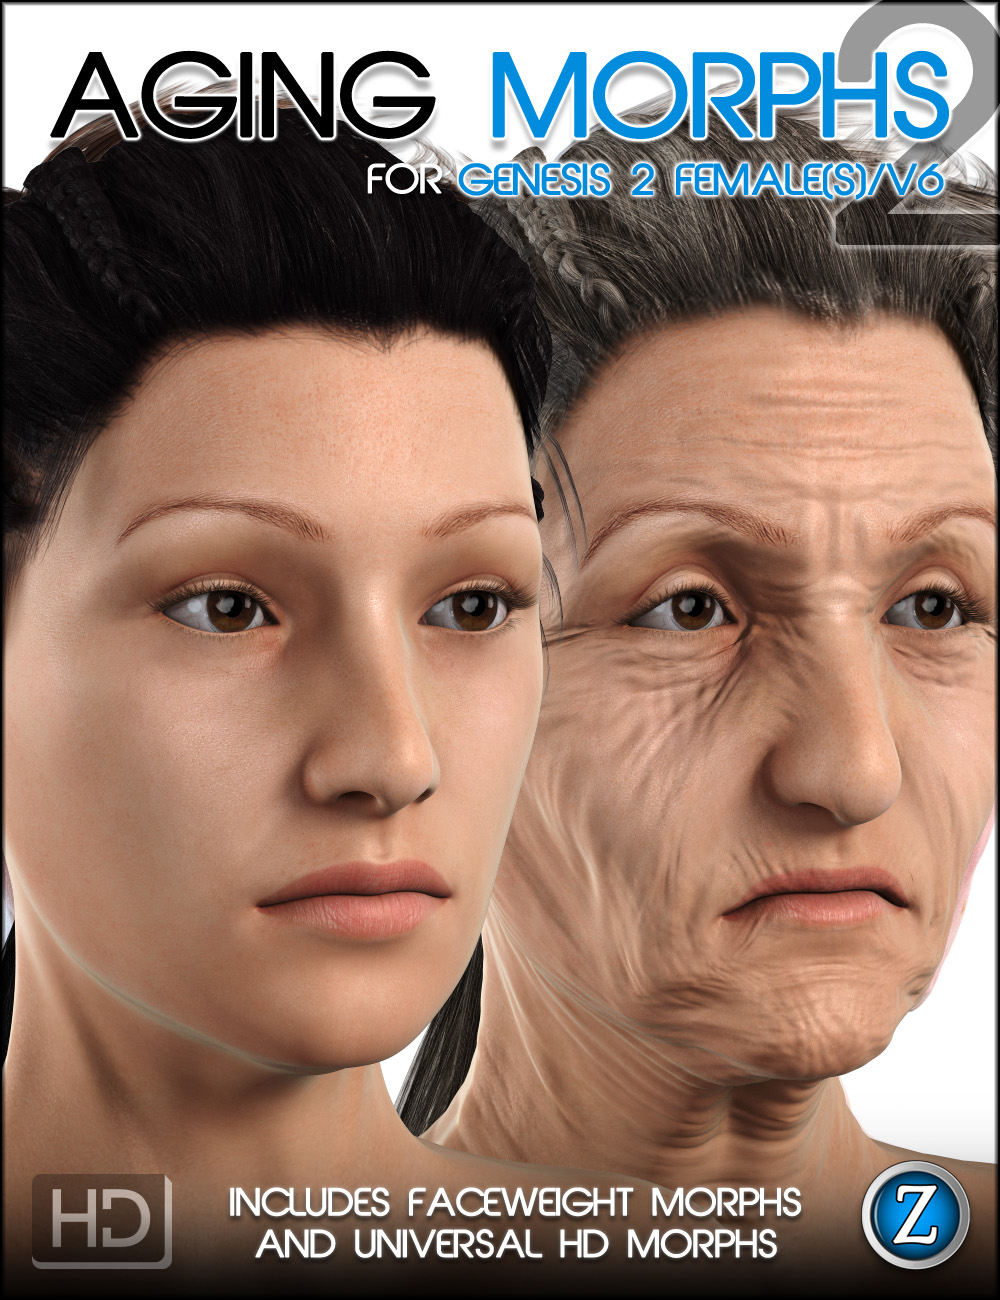 Aging Morphs 2 for Genesis 2 Female(s)/V6 HD by: Zev0, 3D Models by Daz 3D